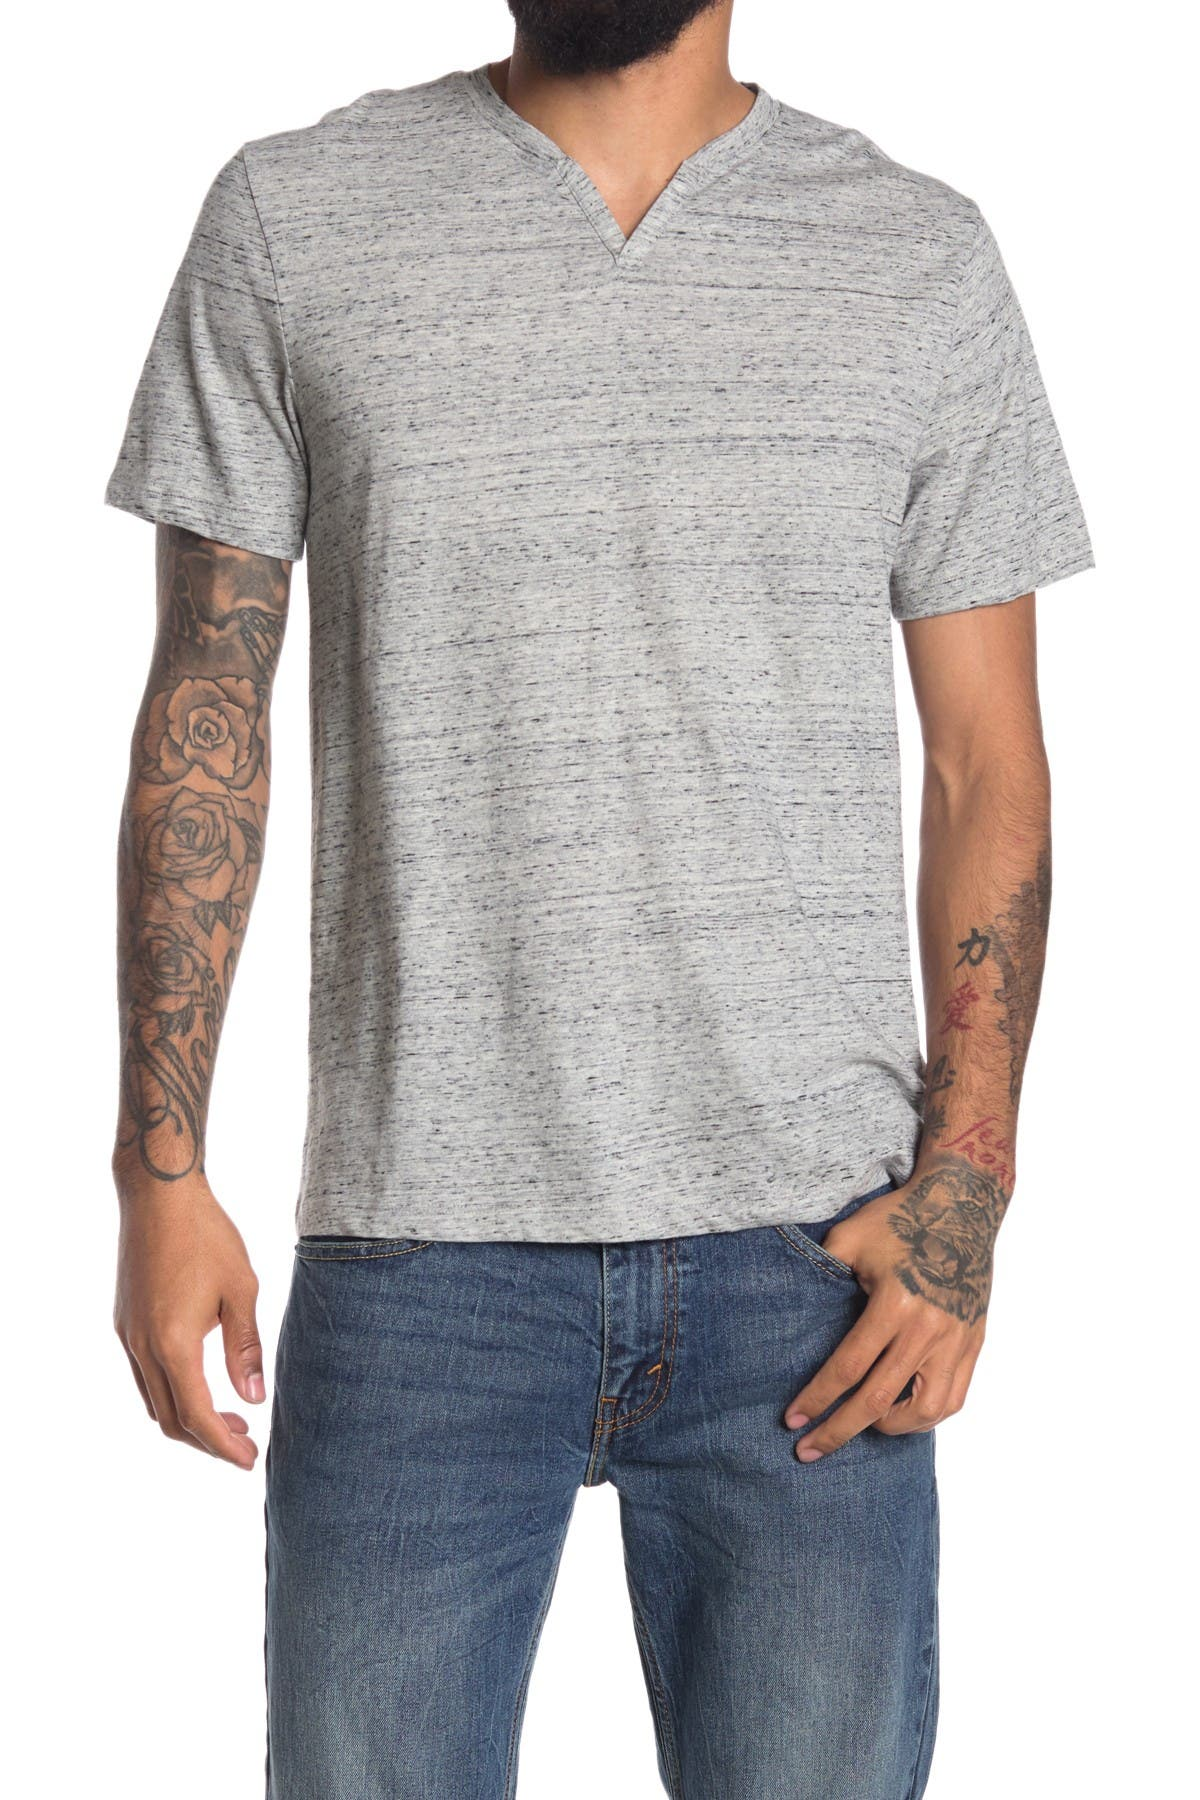 Image of Abound Short Sleeve Textured Notch Neck Tee